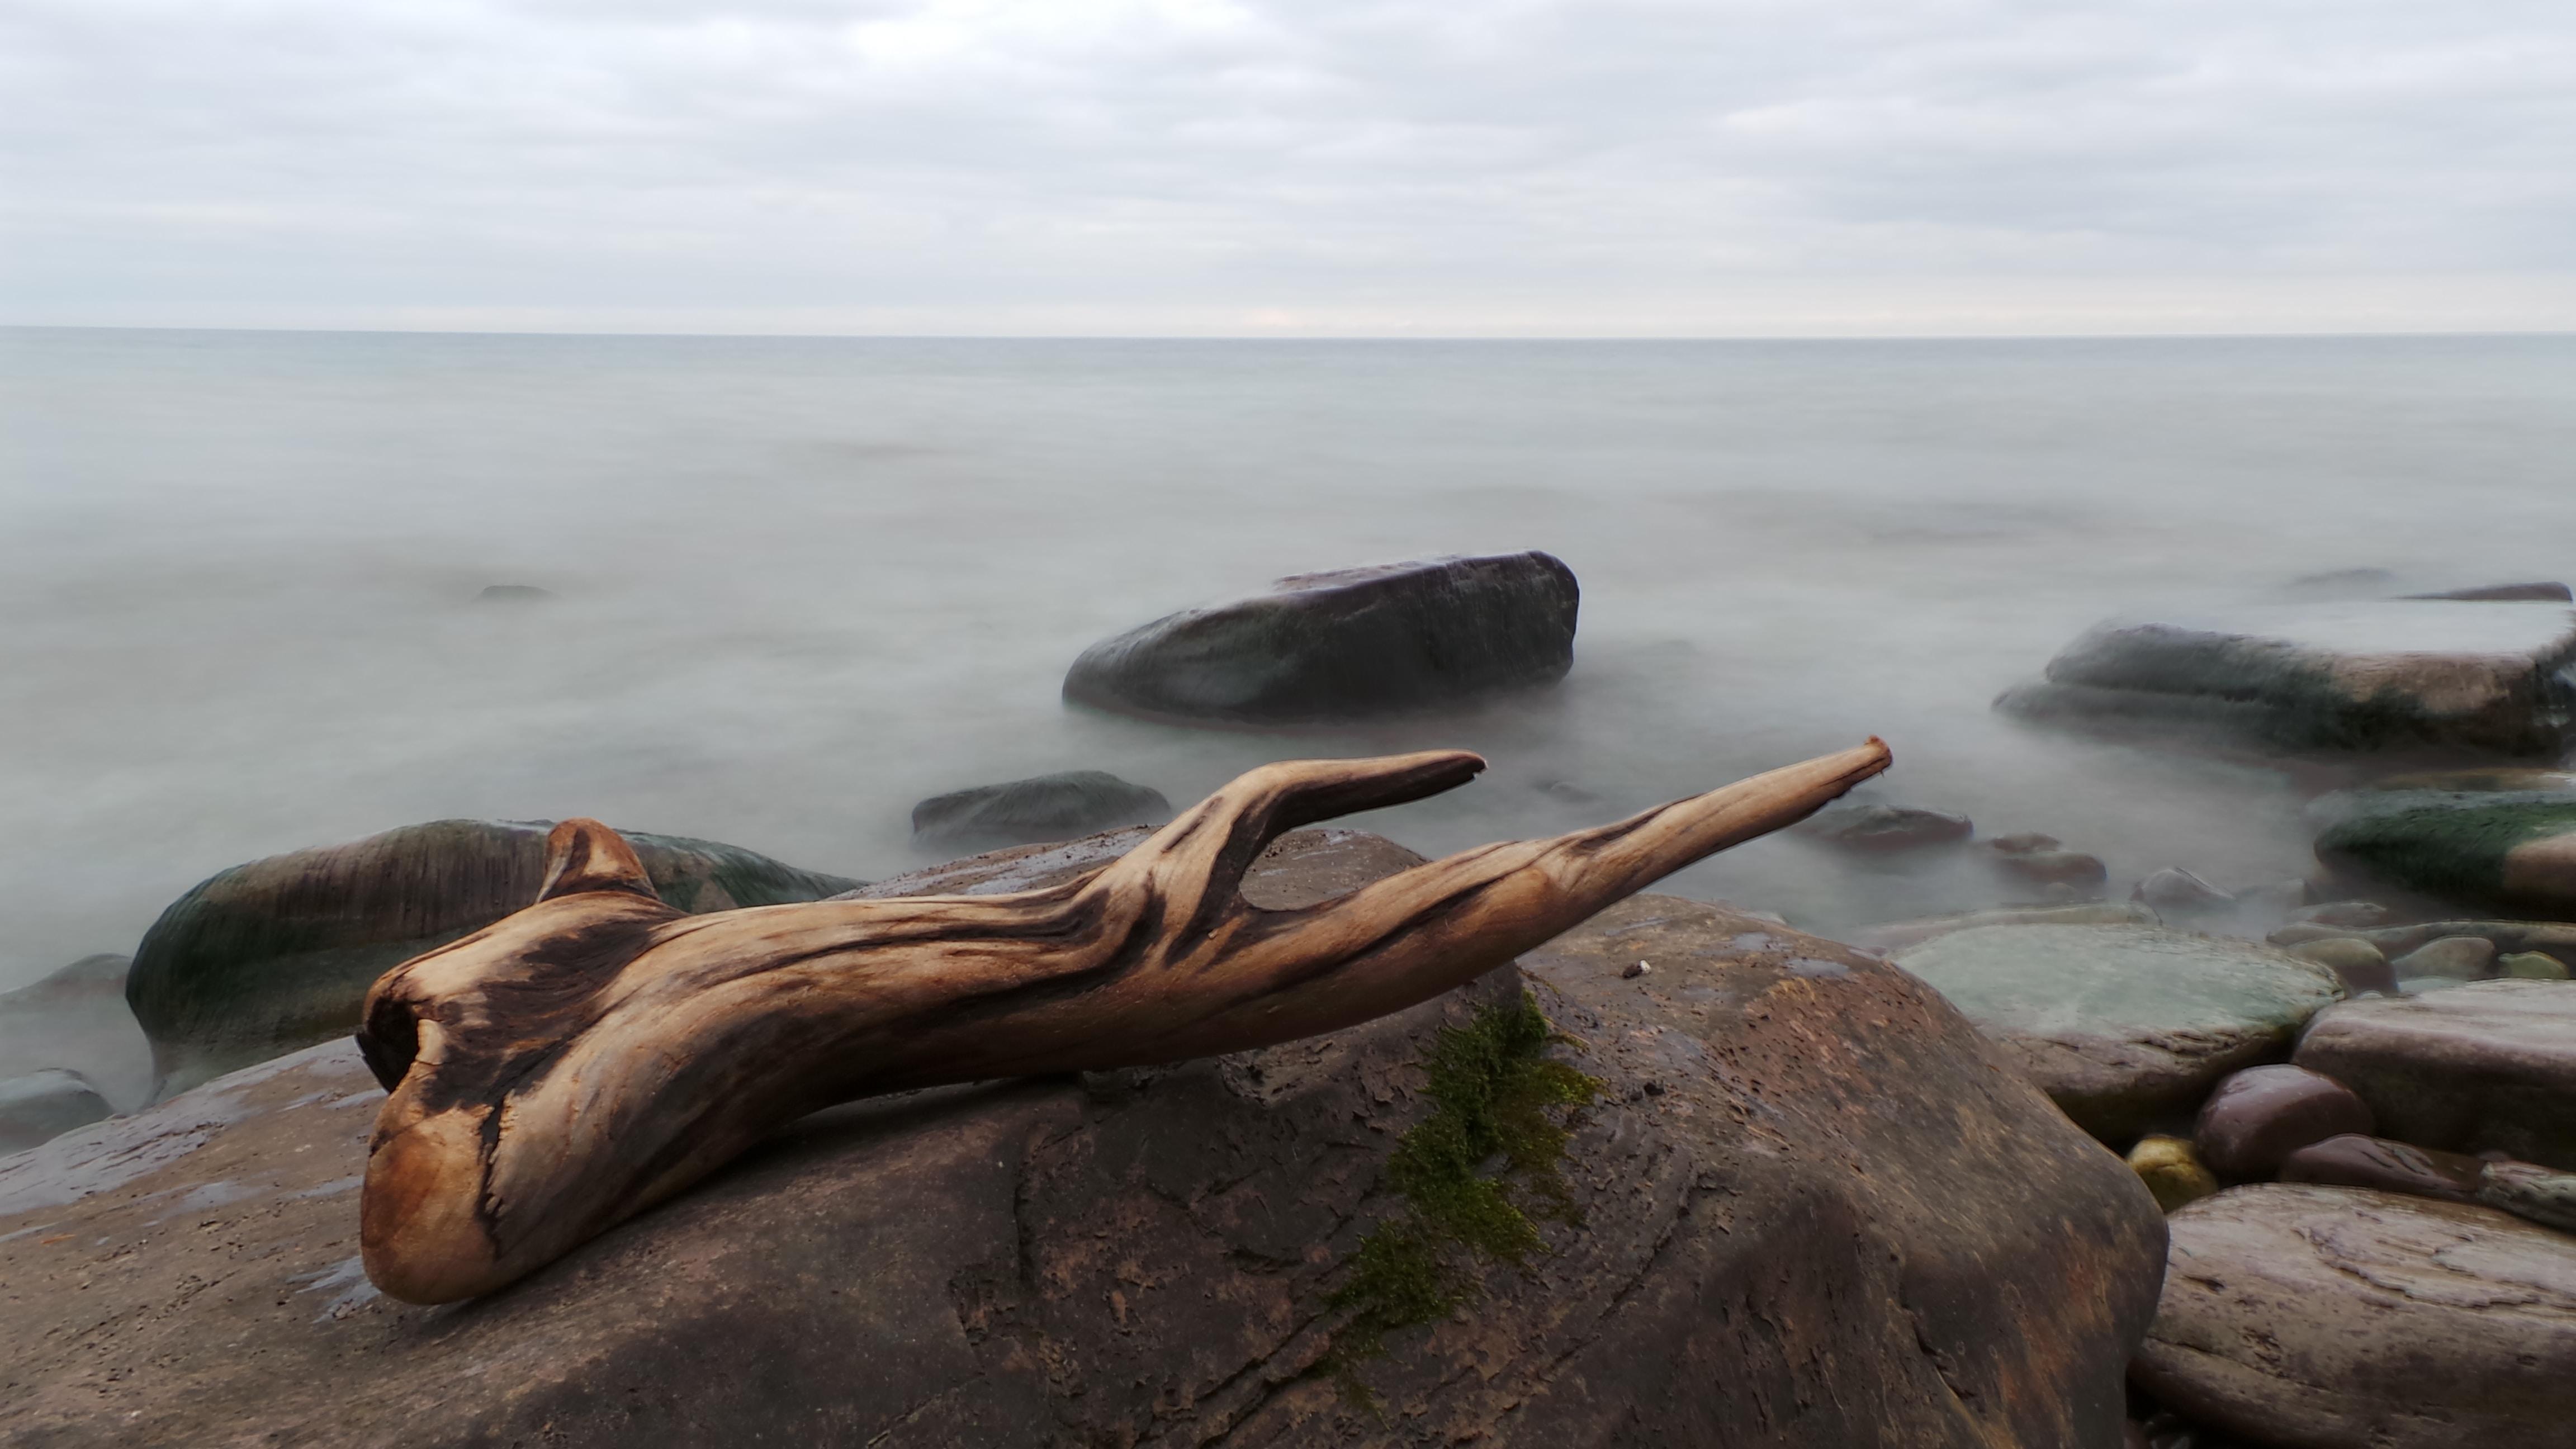 brown wooden tree branch on seashore rock